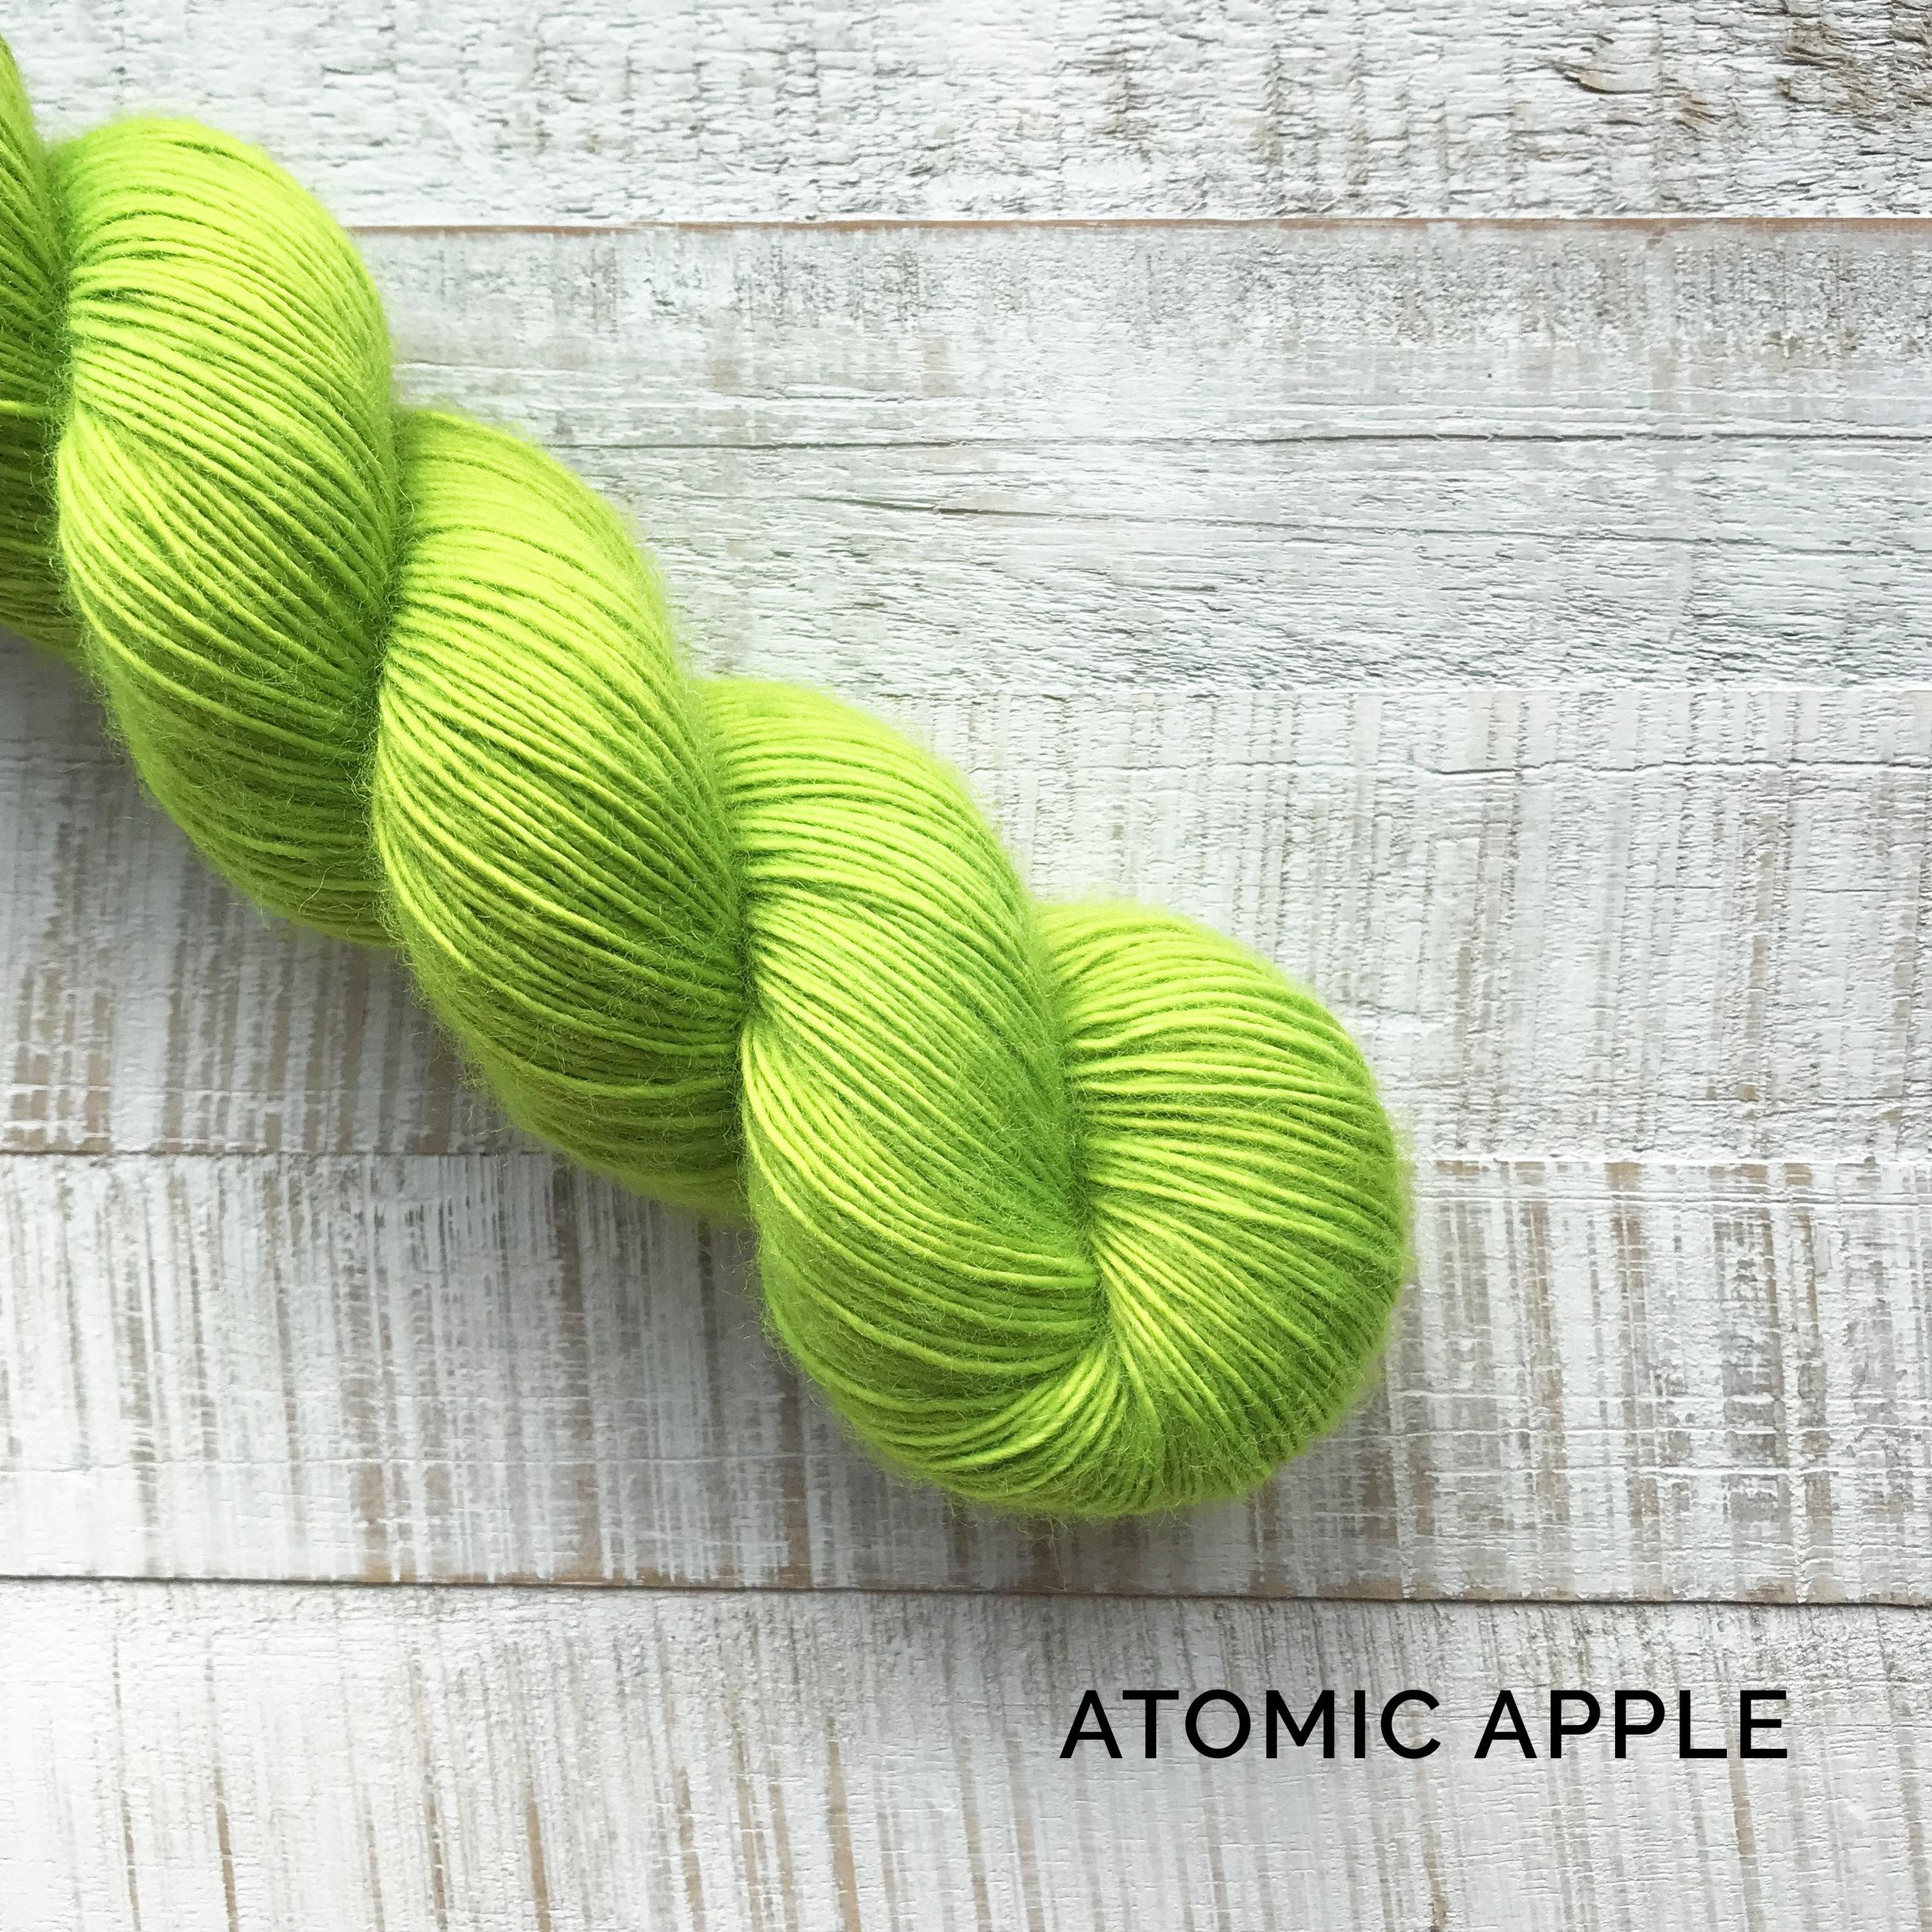 ATOMIC APPLE.jpg